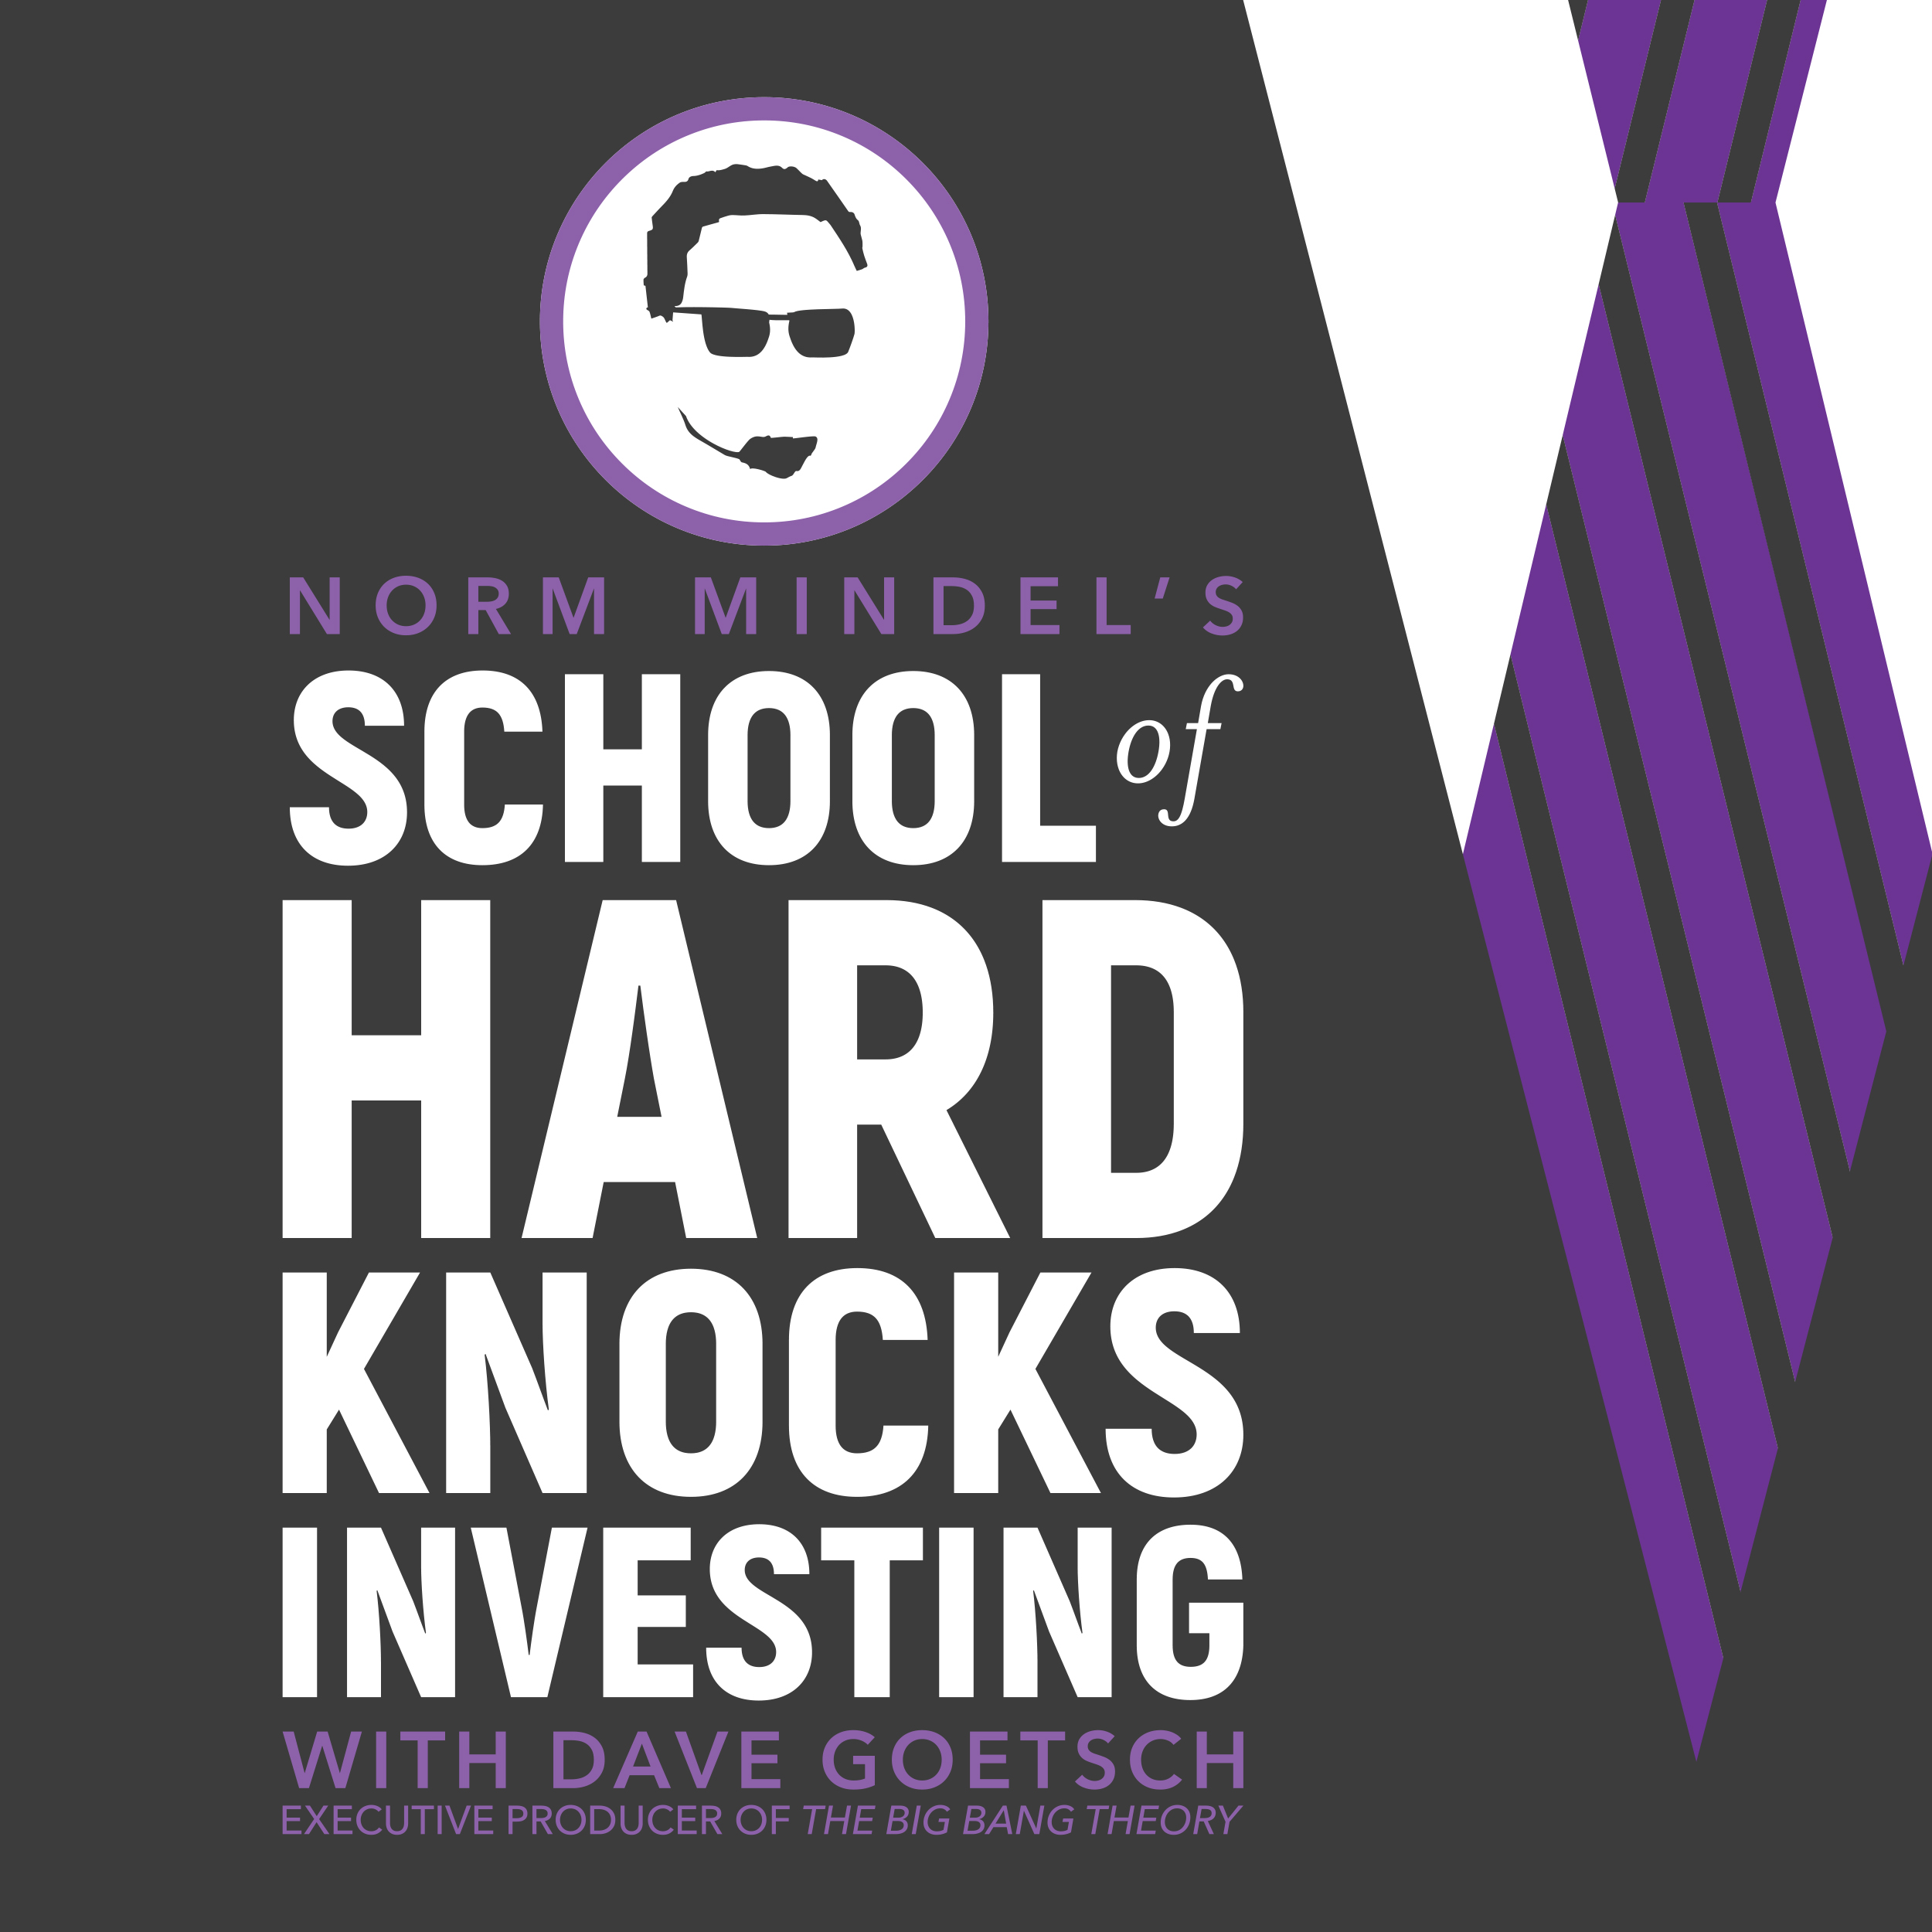 School of Hard Knocks Investing